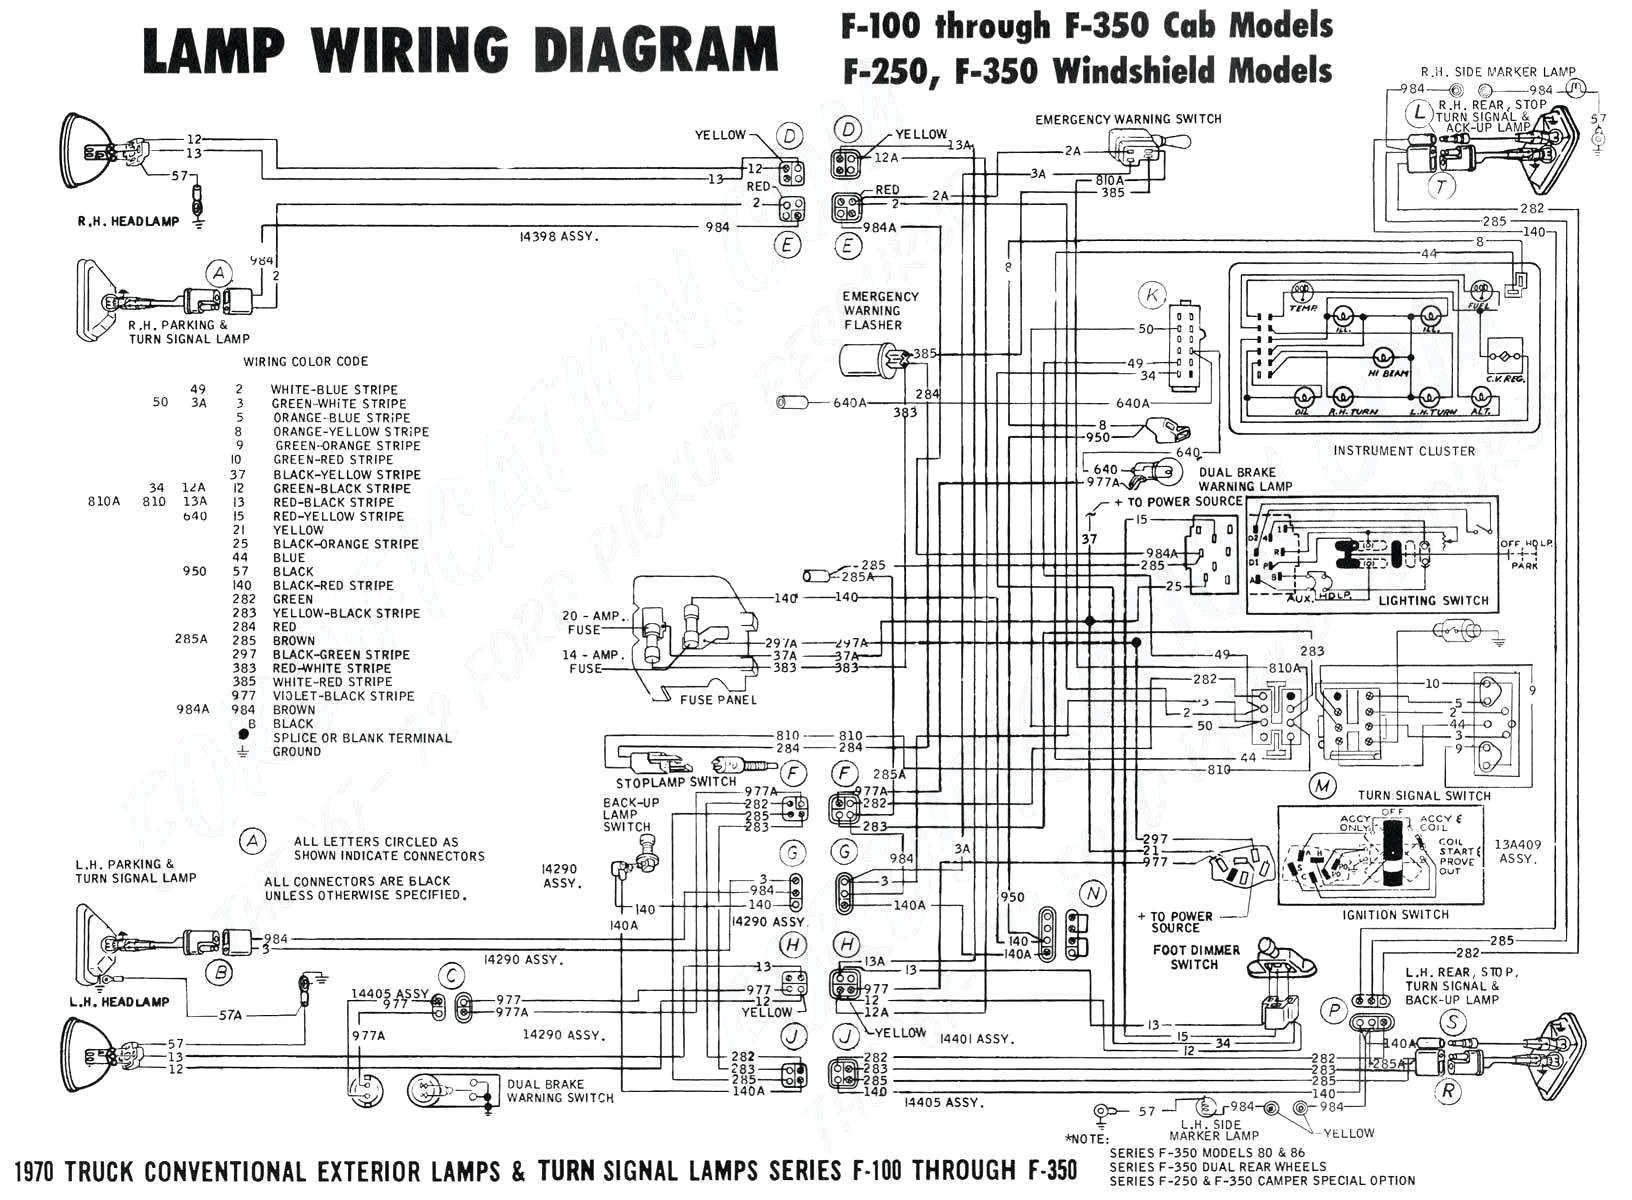 2005 chevy truck wiring diagram wiring diagram database 2005chevysilveradowiringdiagram switch diagram in addition 2005